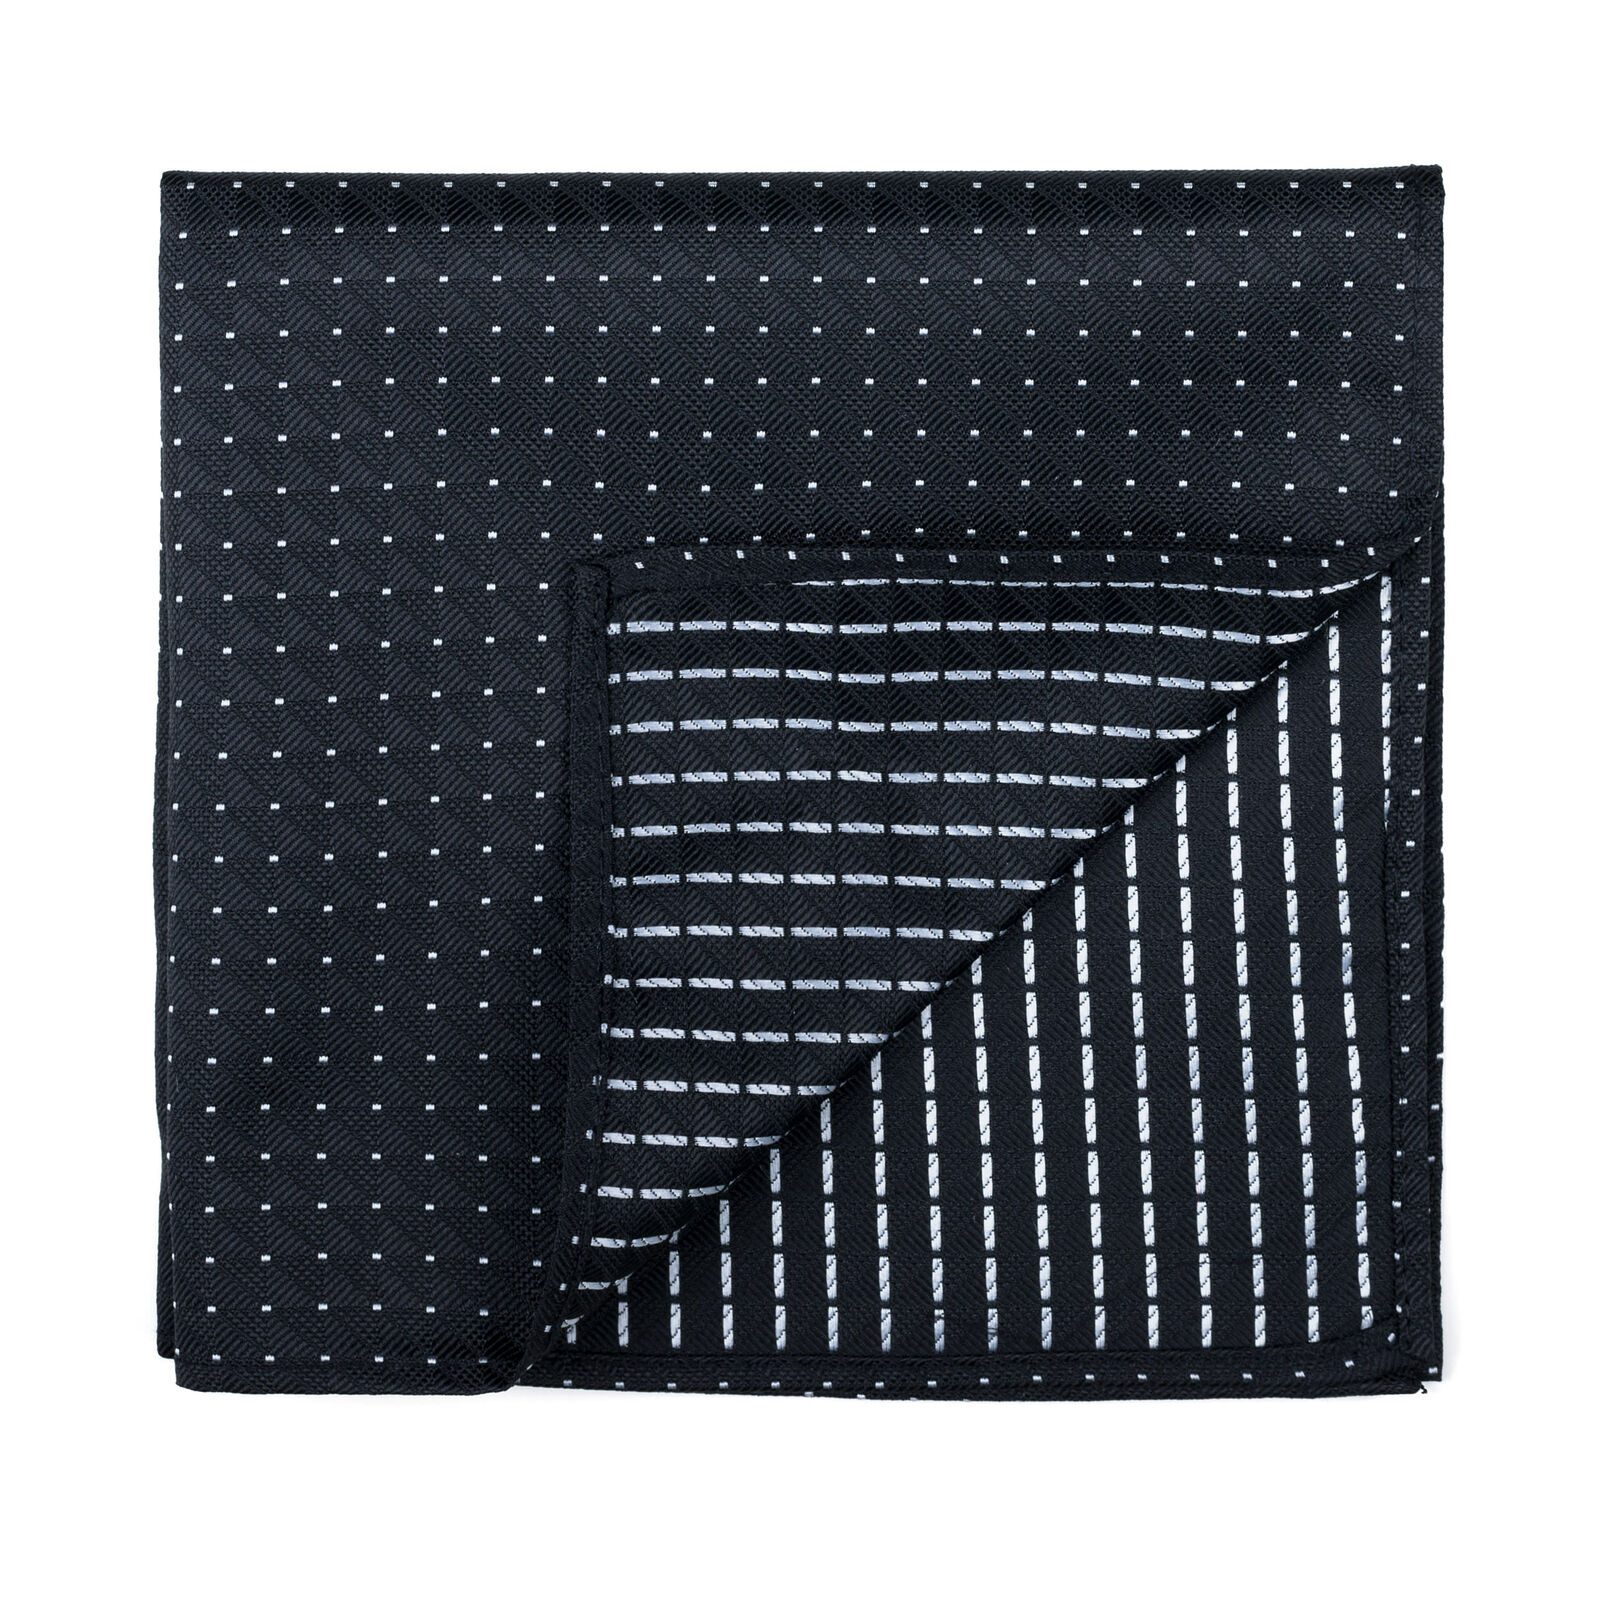 UK Black Pocket Square Fine Polka Dot Wedding Handkerchief Multiple Colours